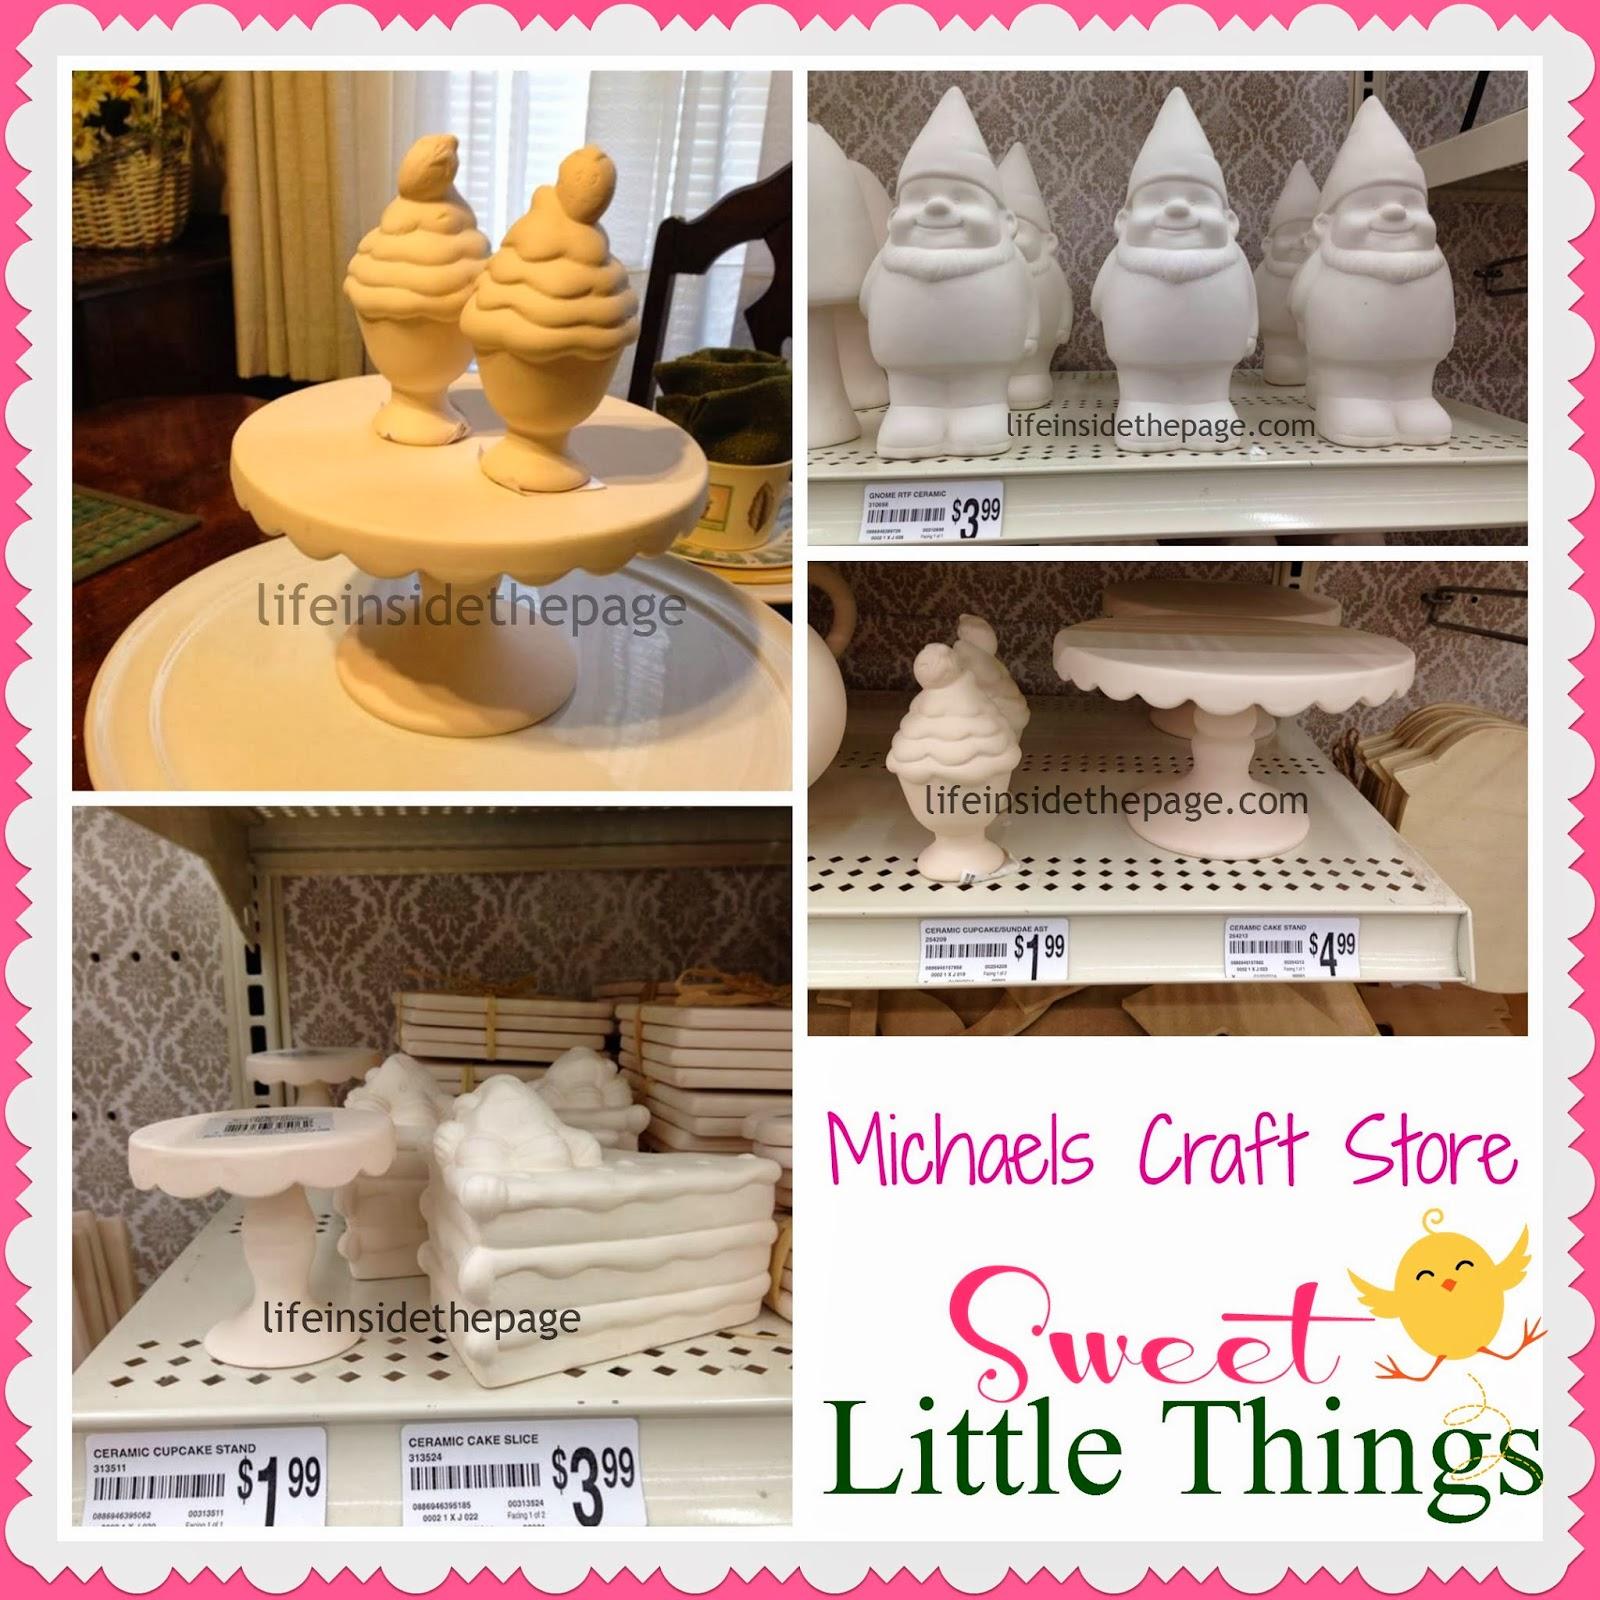 Michaels Craft Store | Sweet Shop | Ceramics